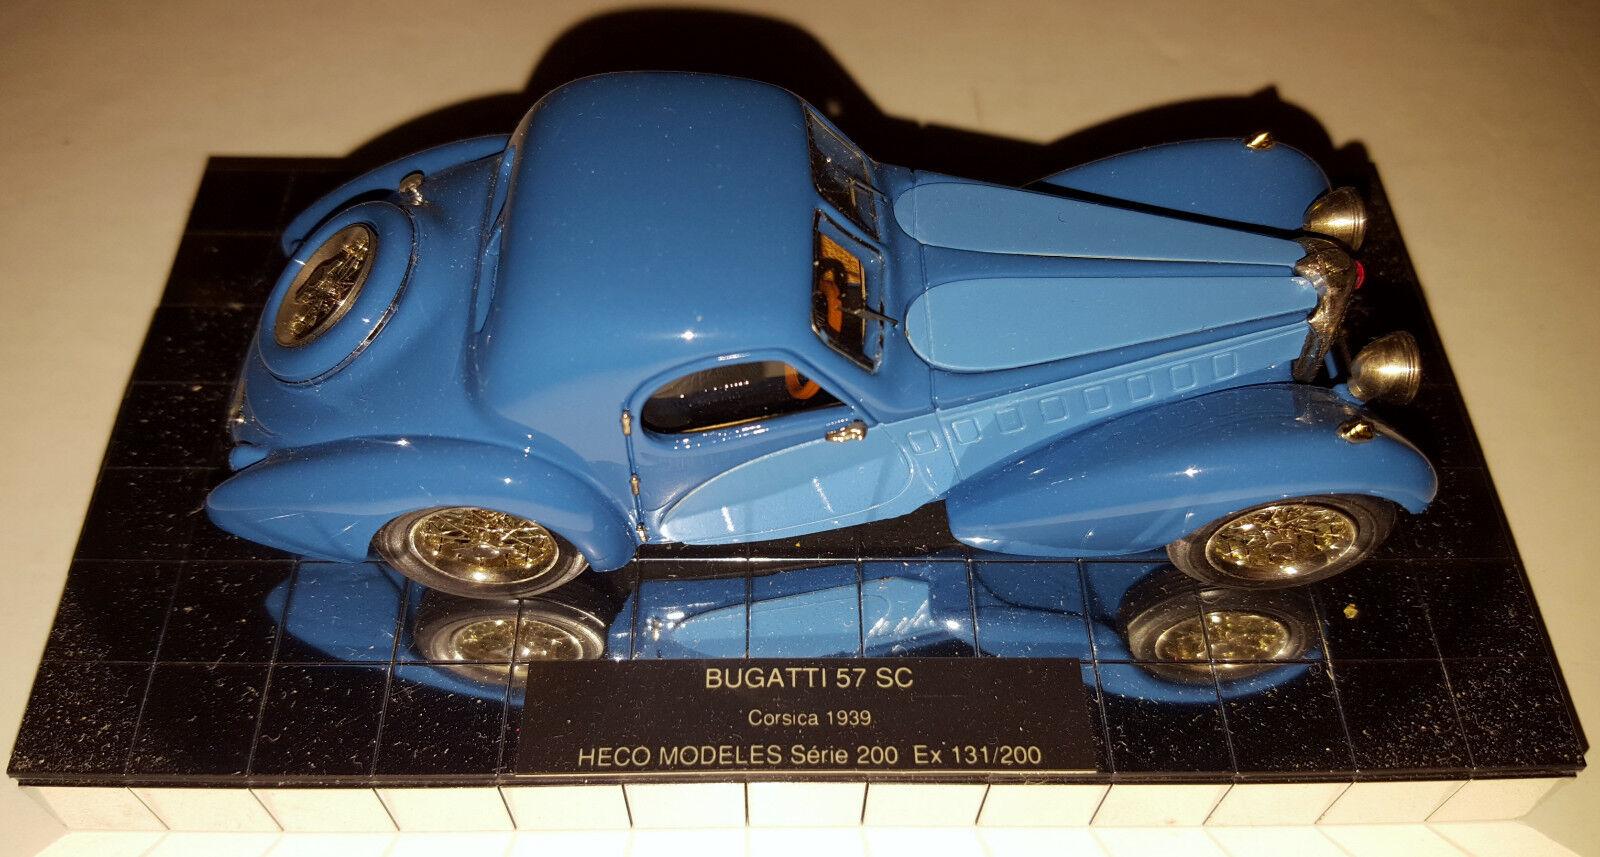 Heco Modeles M 1 43 1939 Bugatti 57 SC Corsica - Two Tone bluee Beauty   200